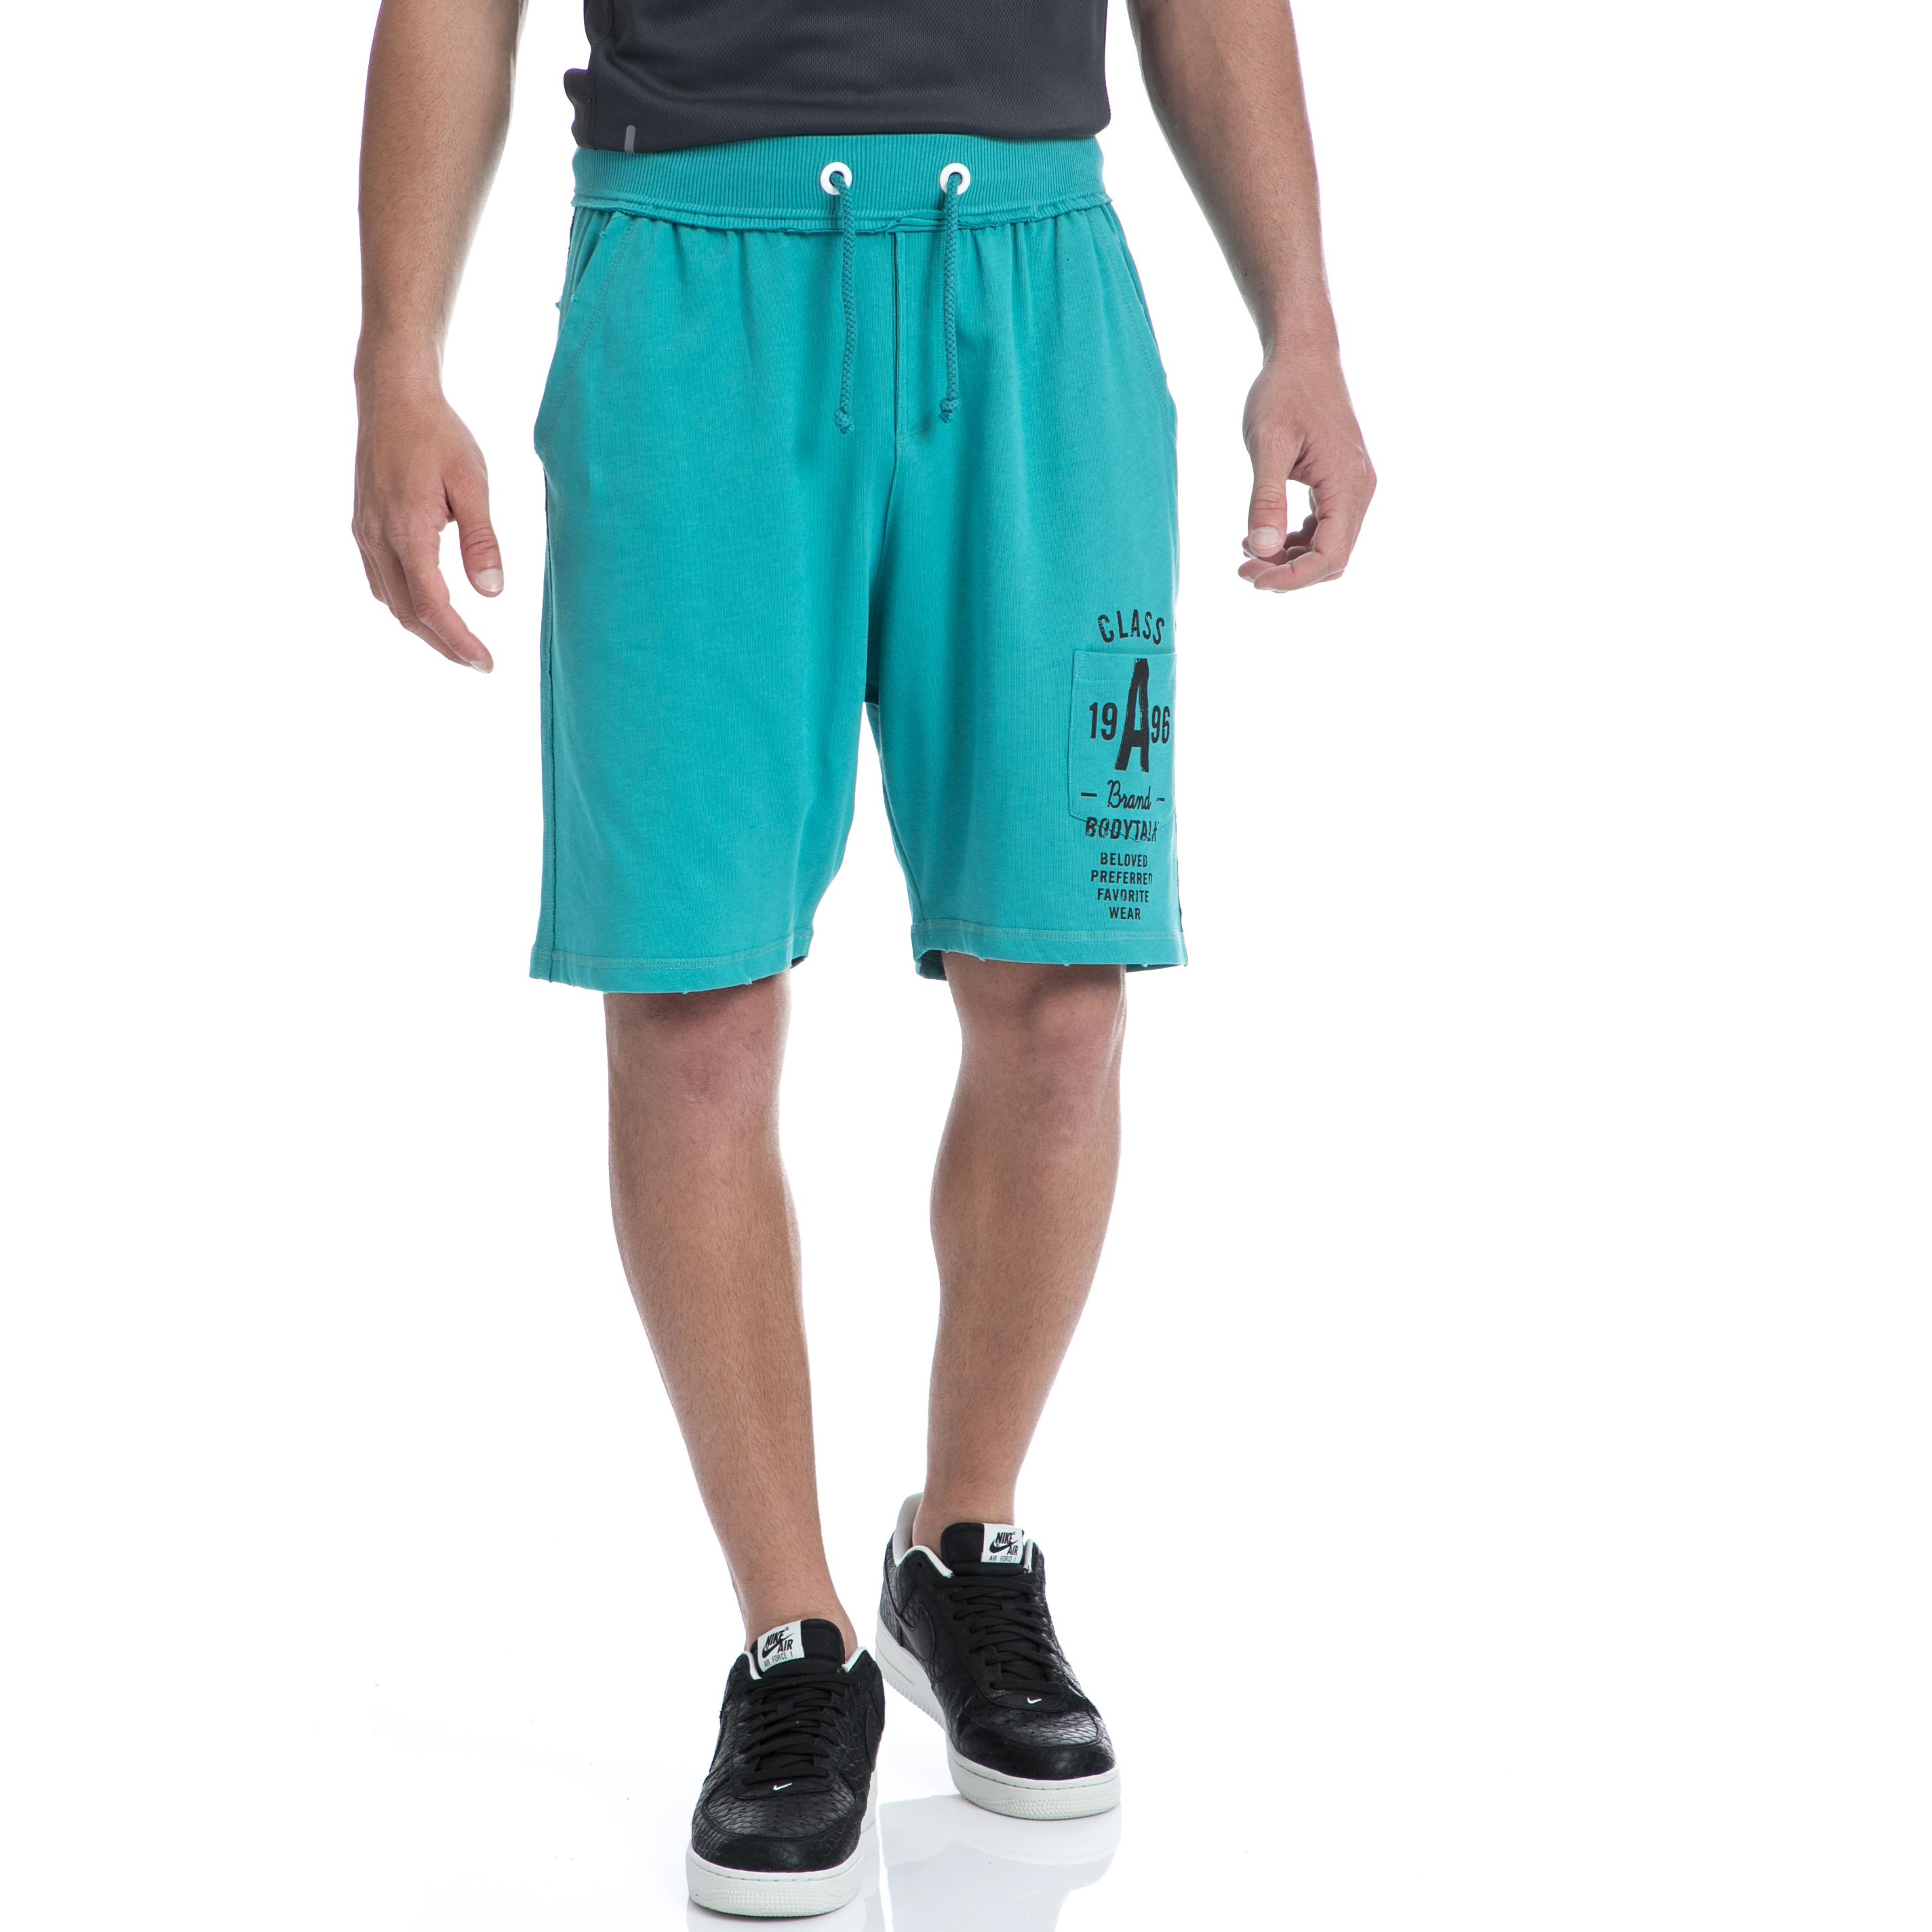 BODYTALK - Ανδρική βερμούδα BODYTALK πράσινη ανδρικά ρούχα σορτς βερμούδες αθλητικά